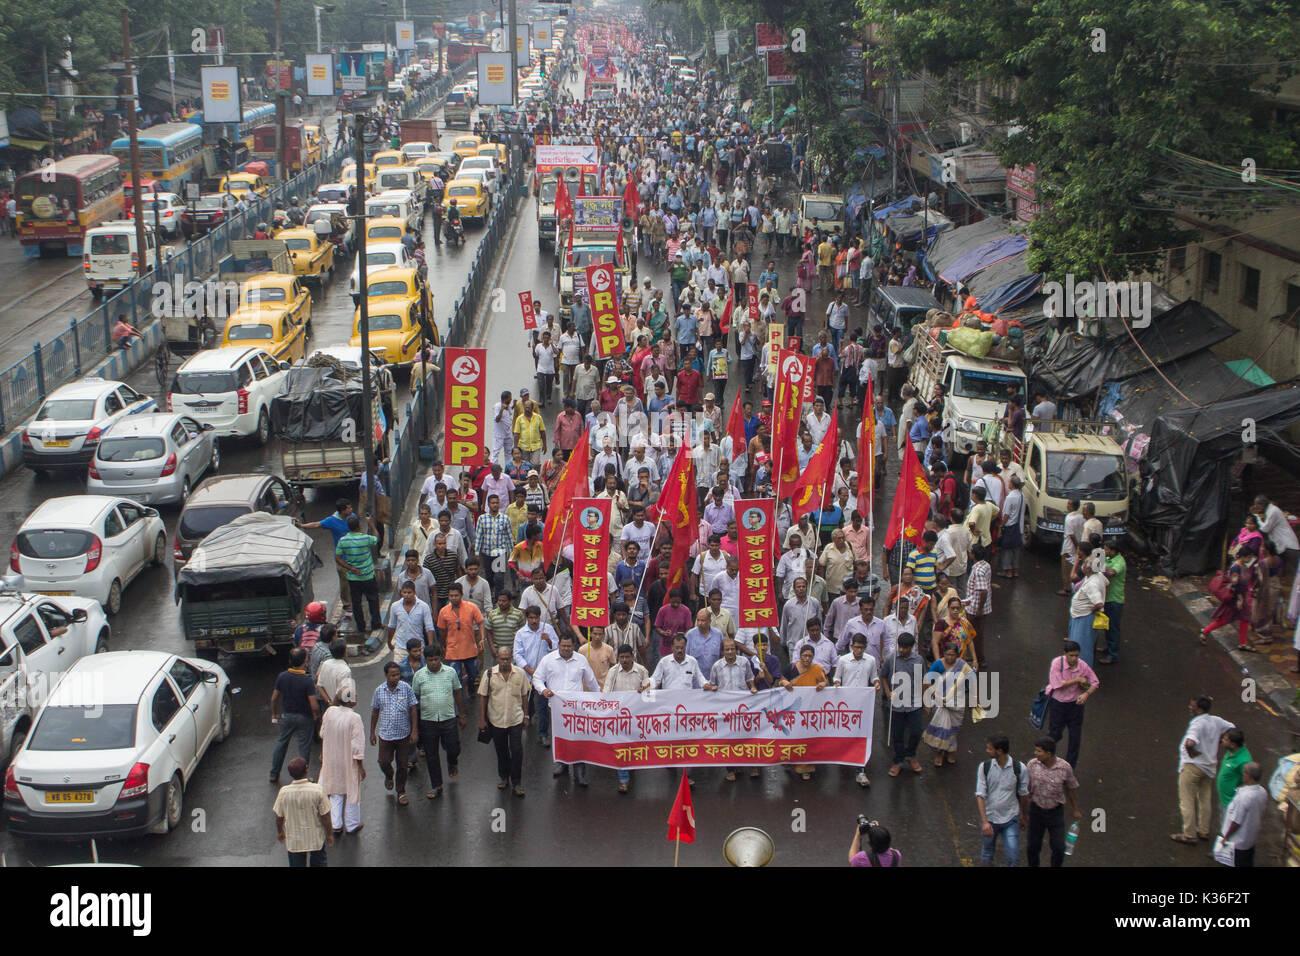 Kolkata, India. 01st Sep, 2017. kolkata,India, 01 september, 2017. Traffic came to a halt due to the anti-imperialist rally Credit: Sudip Maiti/Alamy Live News - Stock Image